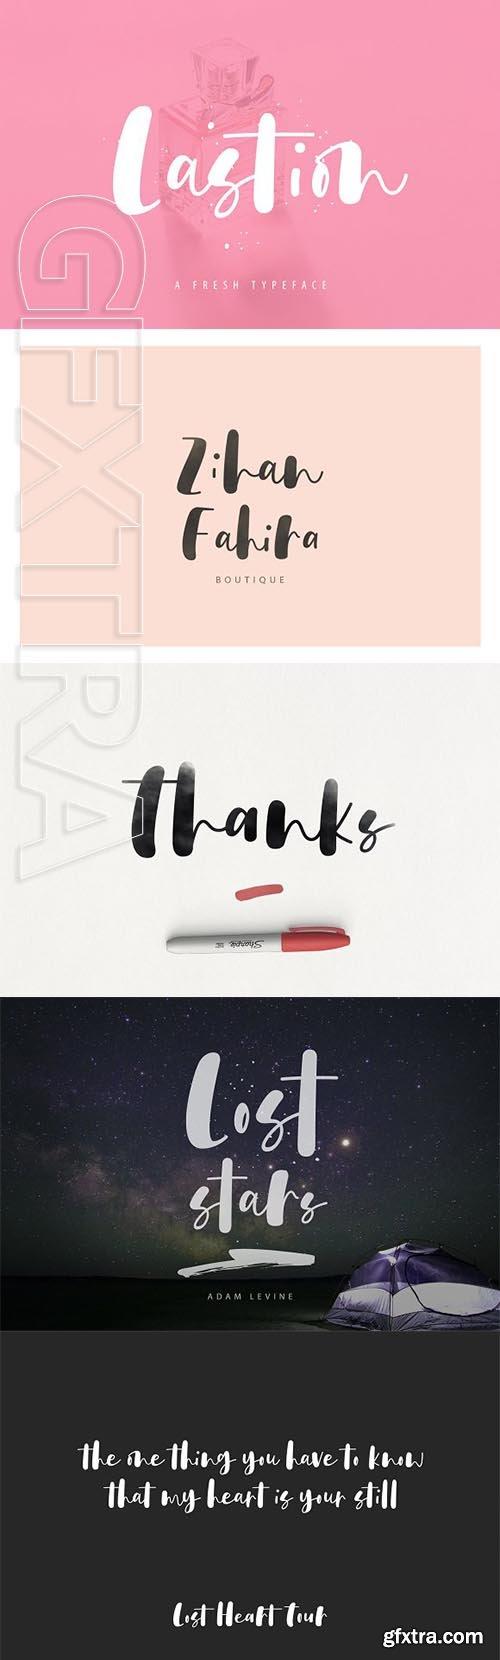 CreativeMarket - Lastion Typeface 2736335